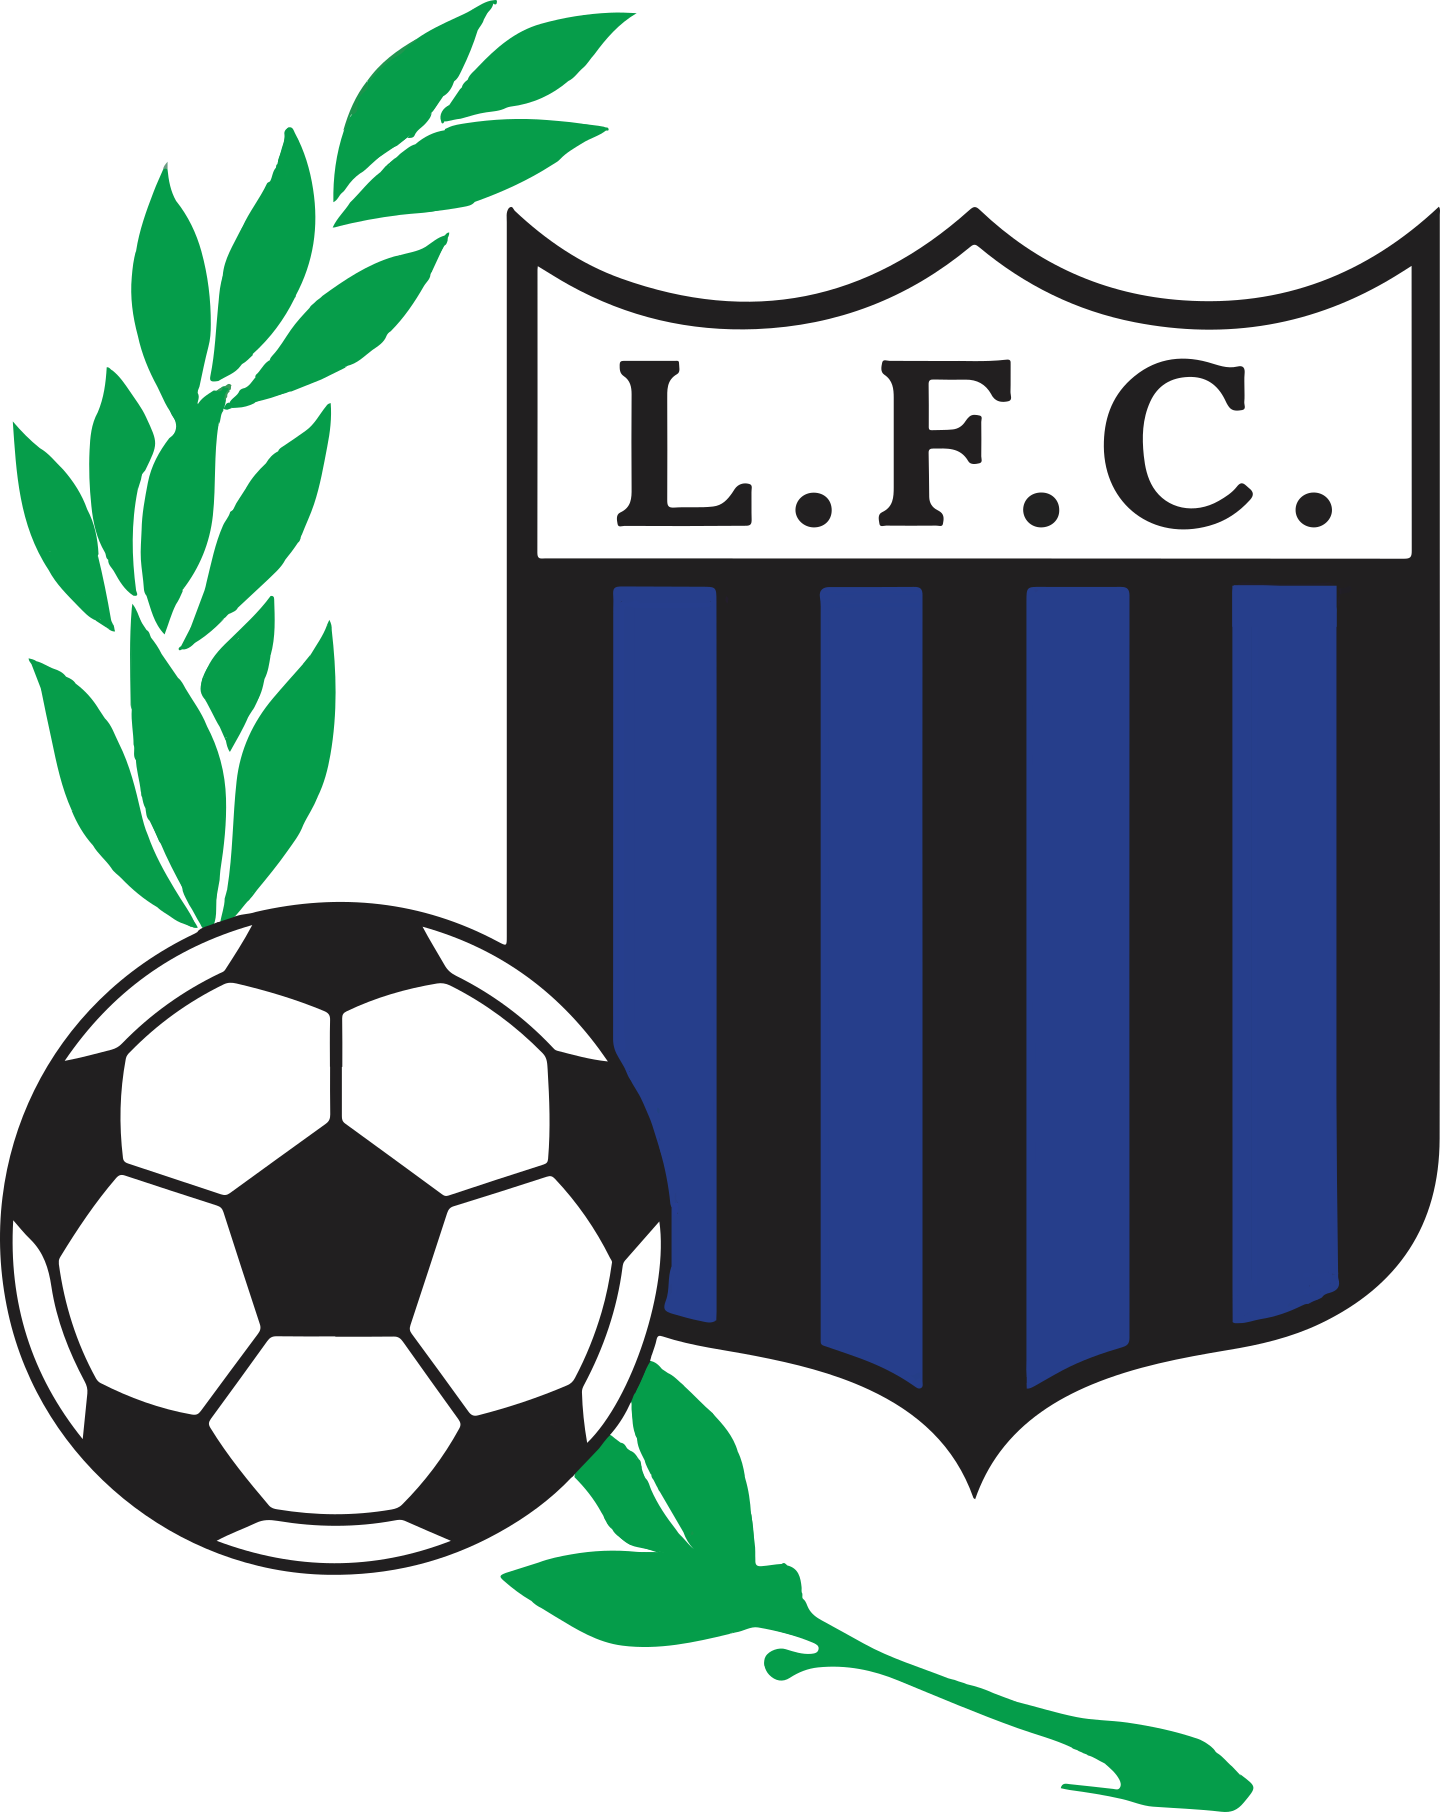 liverpool fc uruguai logo 2 - Liverpool FC (Uruguay) - Logo